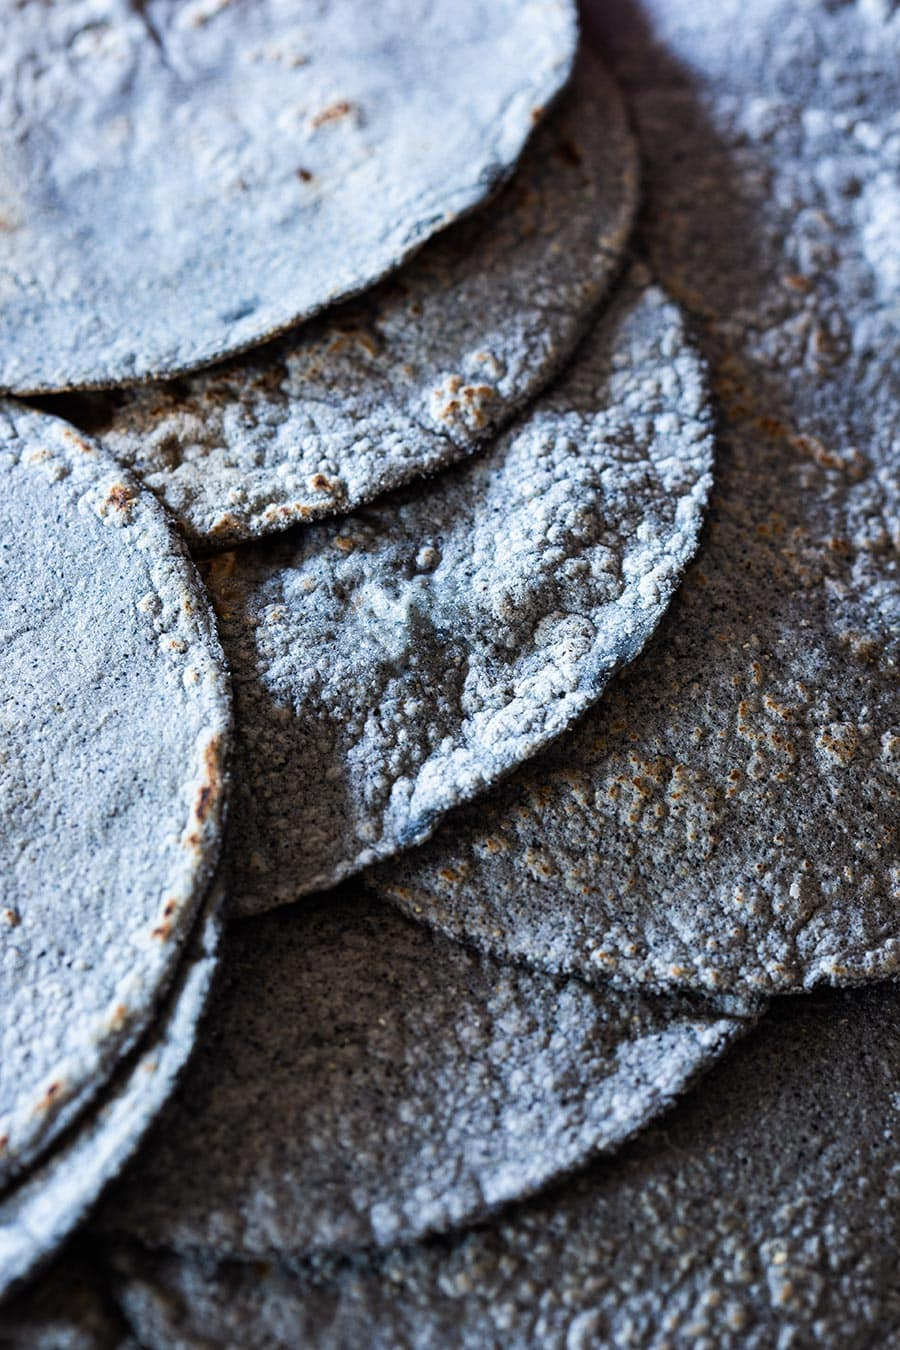 Closeup on blue corn tortilla.